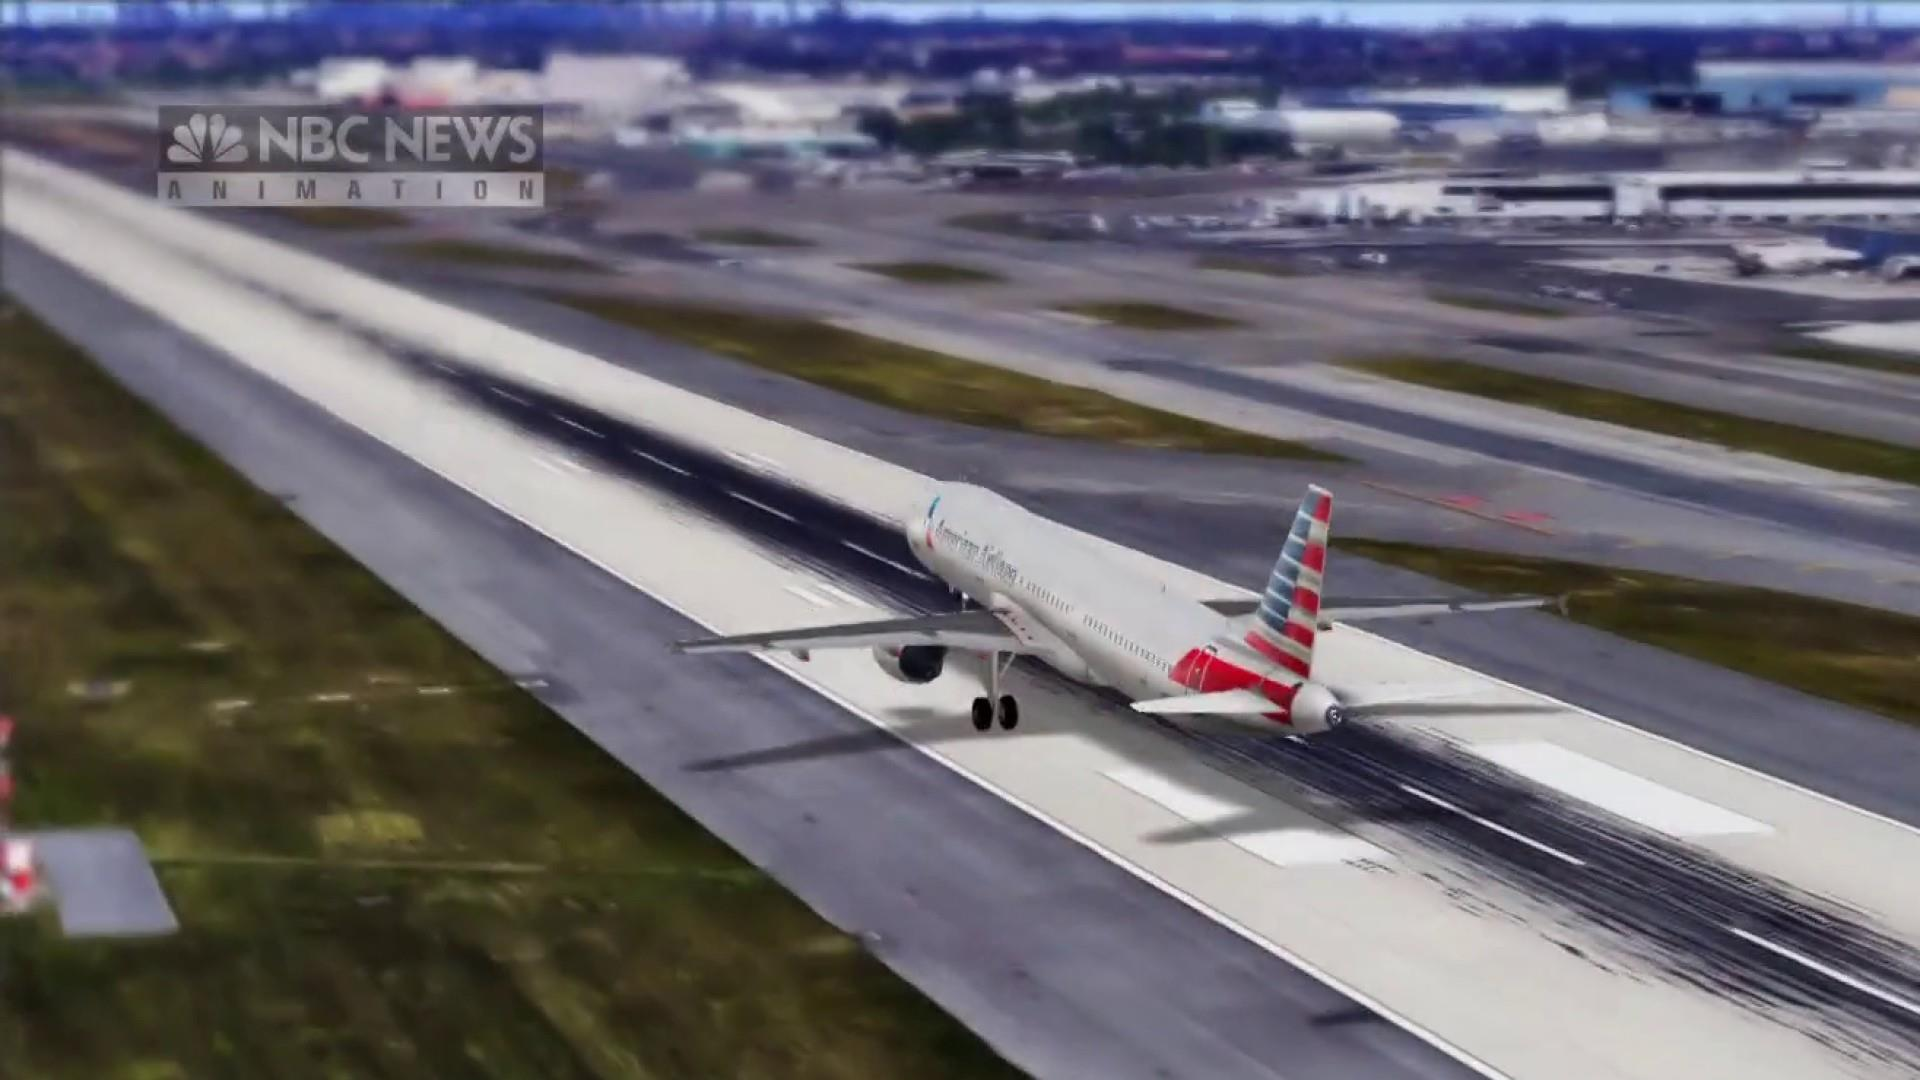 Passenger jet that struck object at JFK could have crashed, sources say